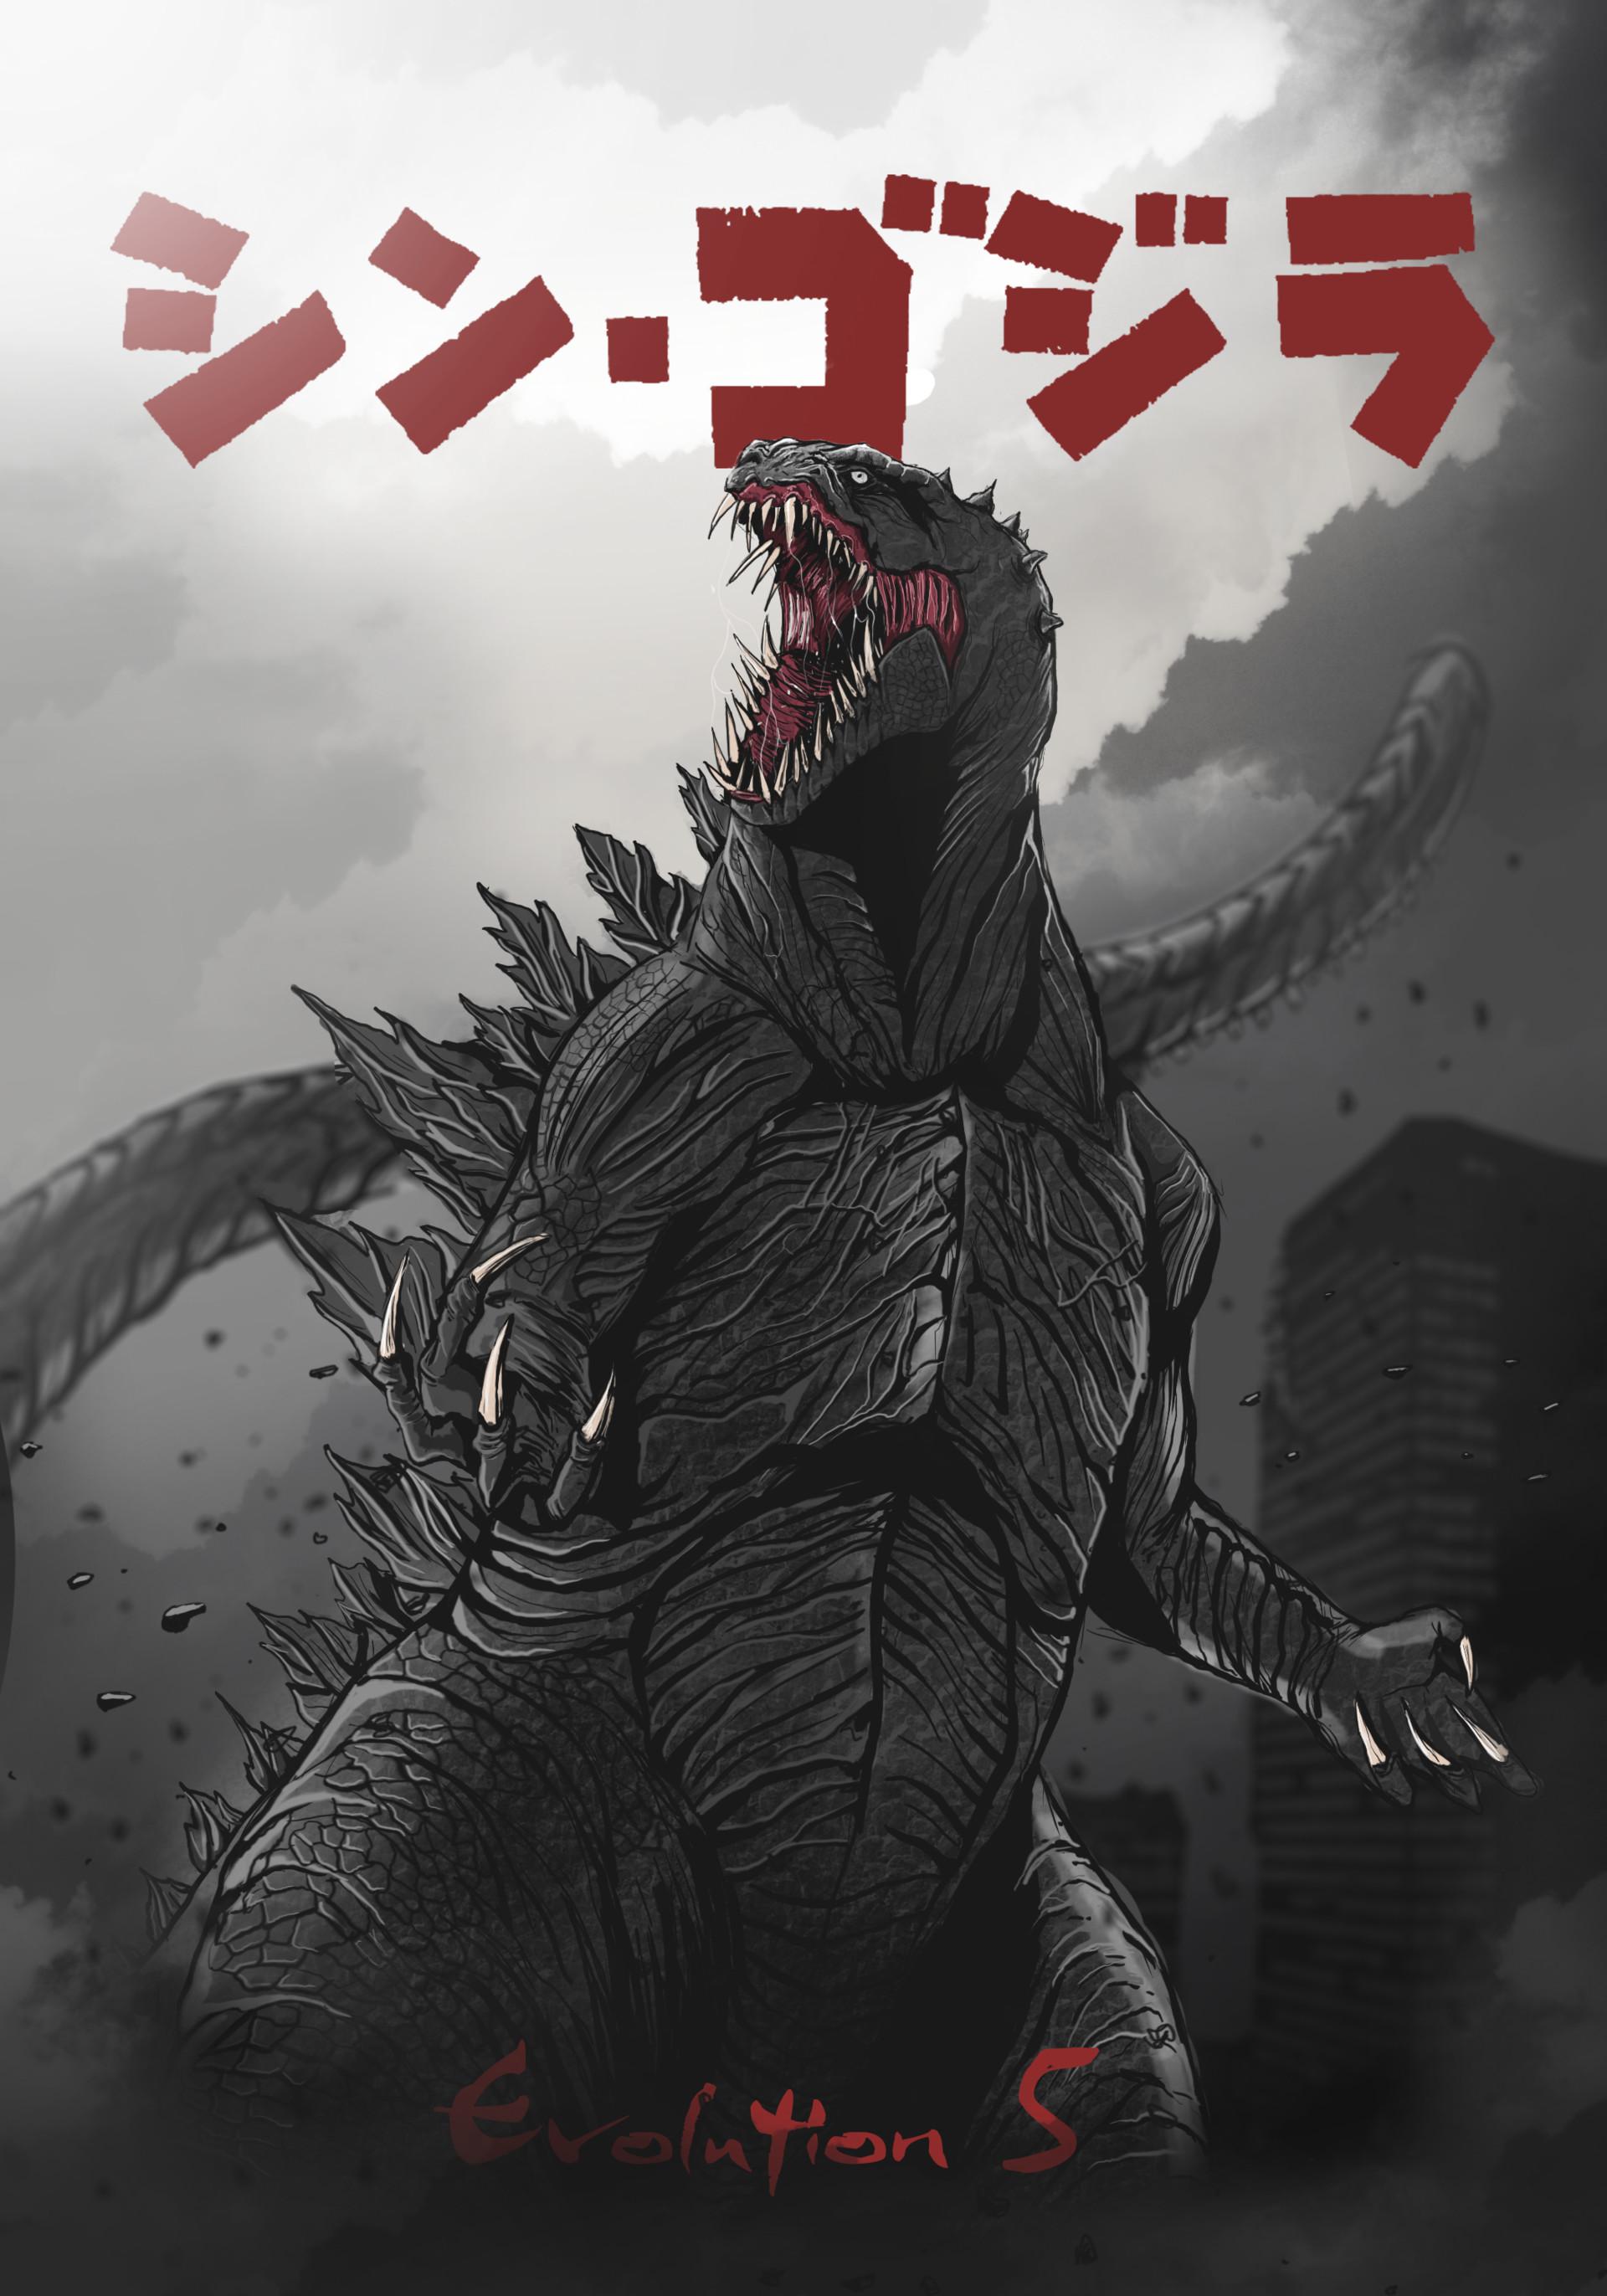 ArtStation - Shin Gojira Evolution 5, Birmel Guerrero